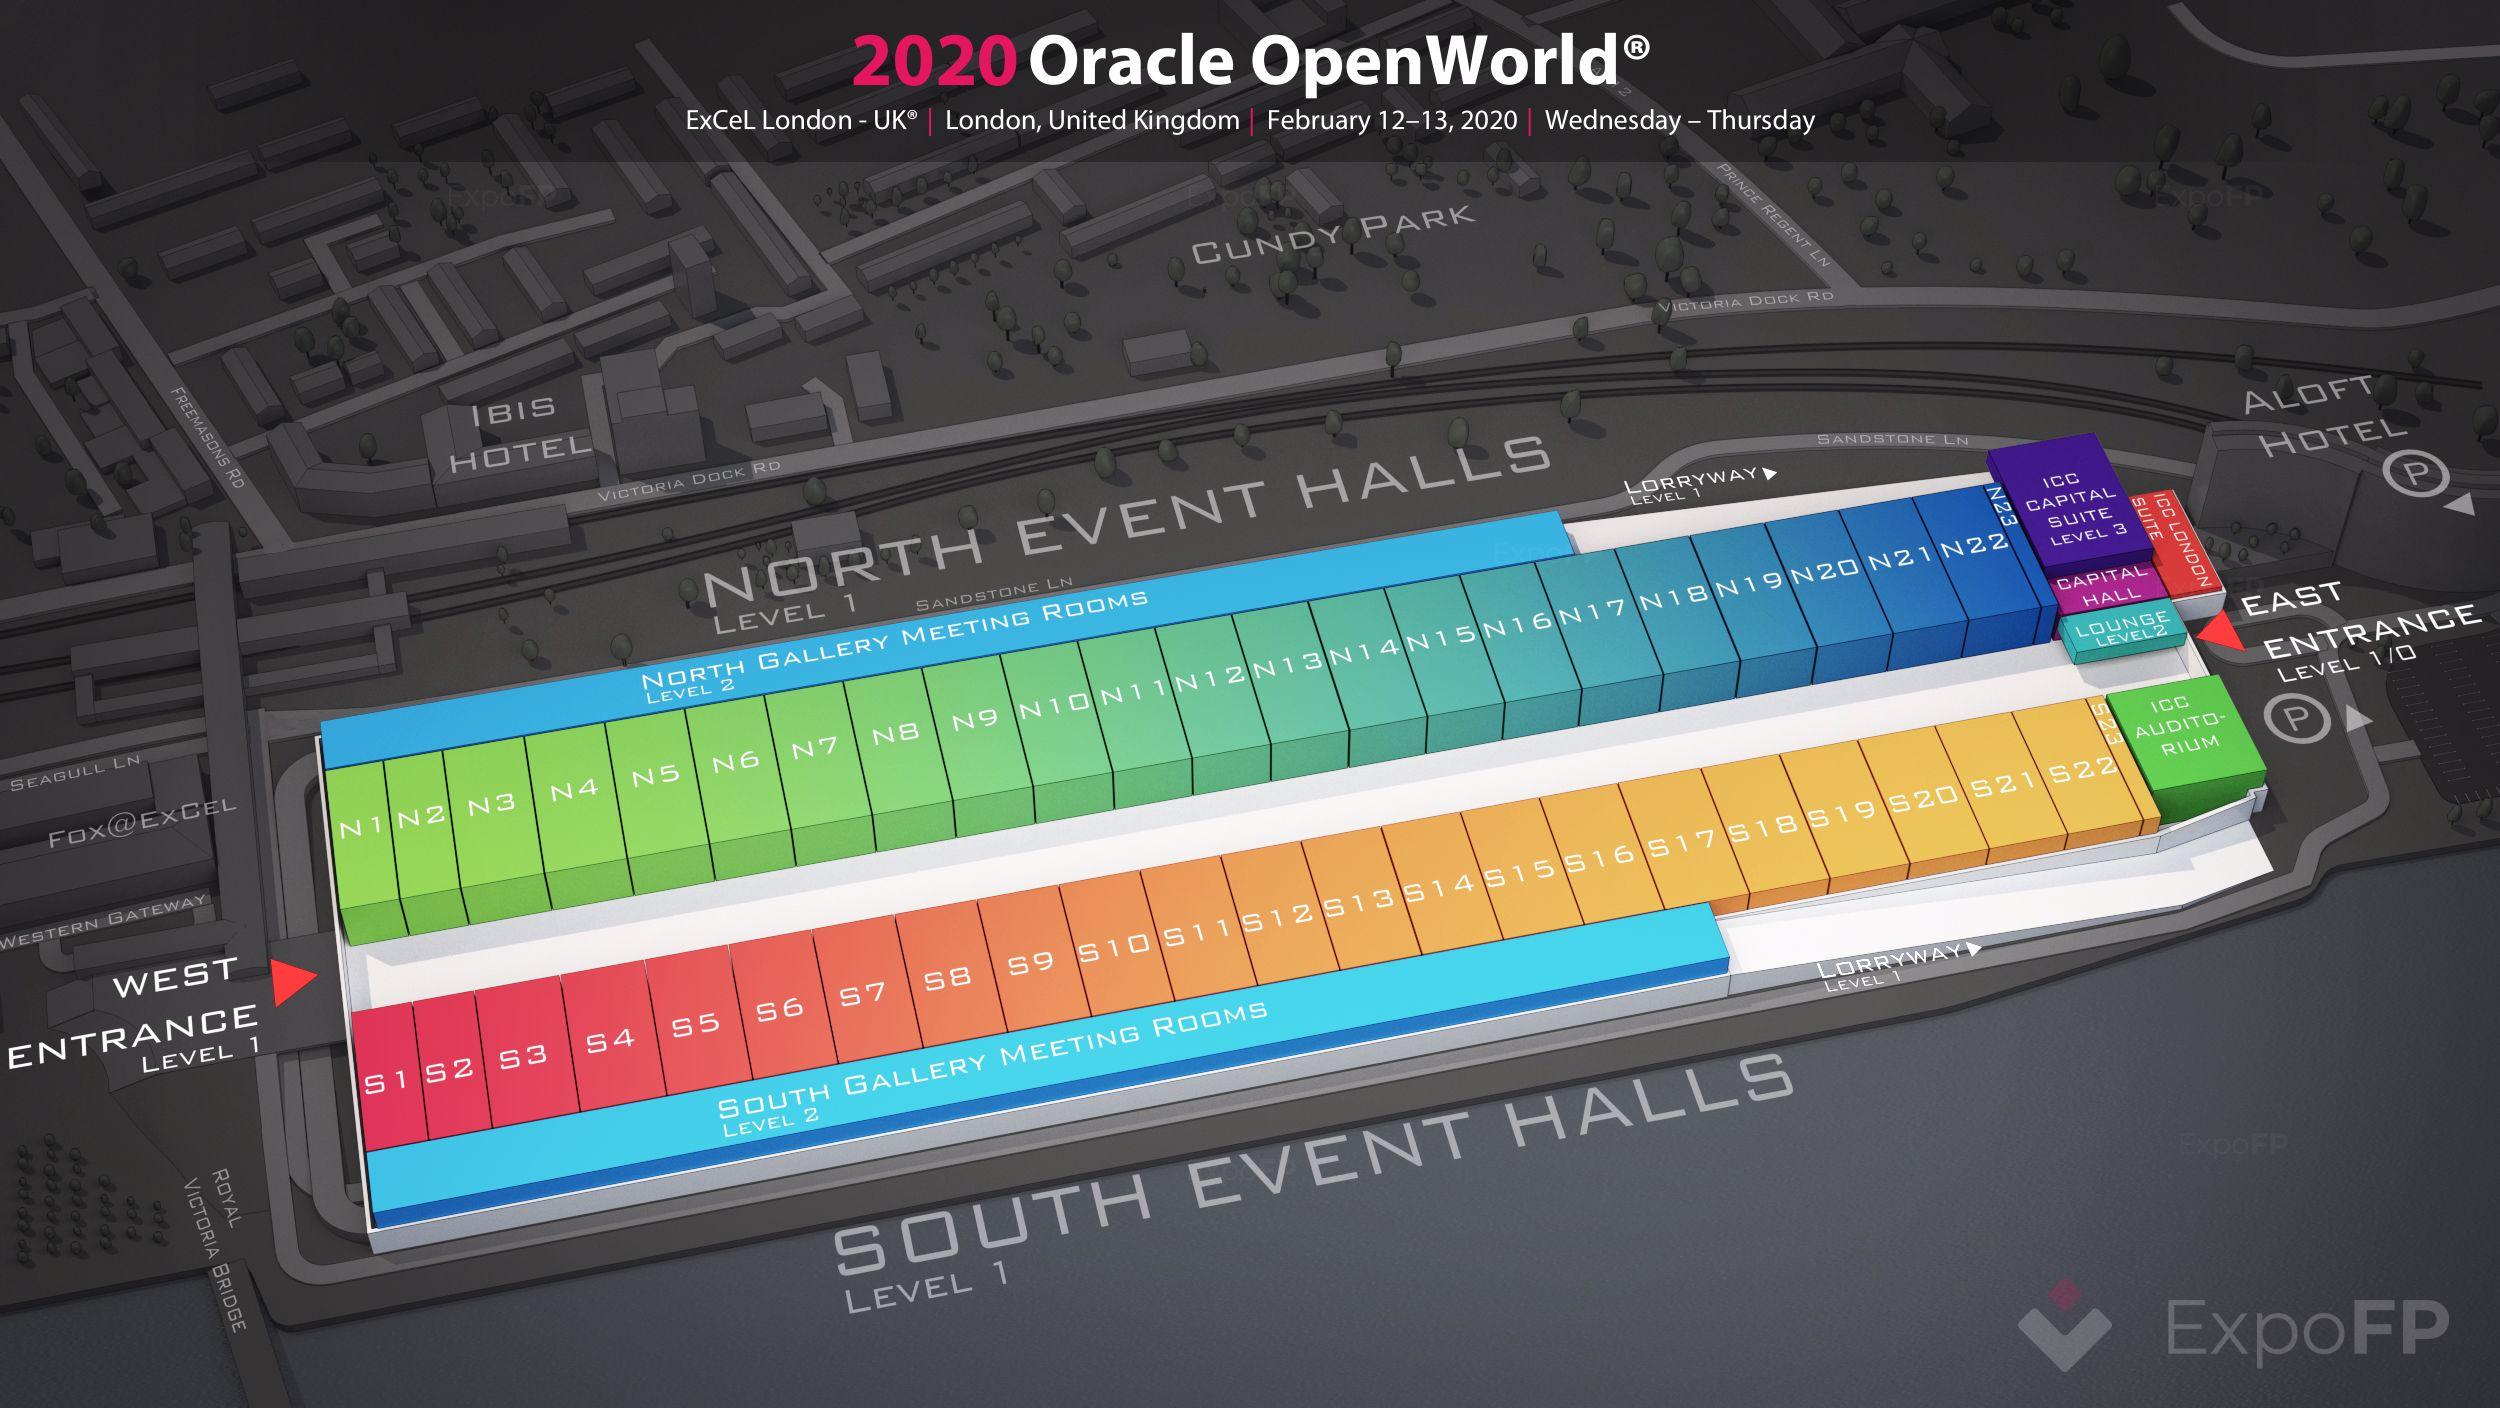 Oracle openworld 2020